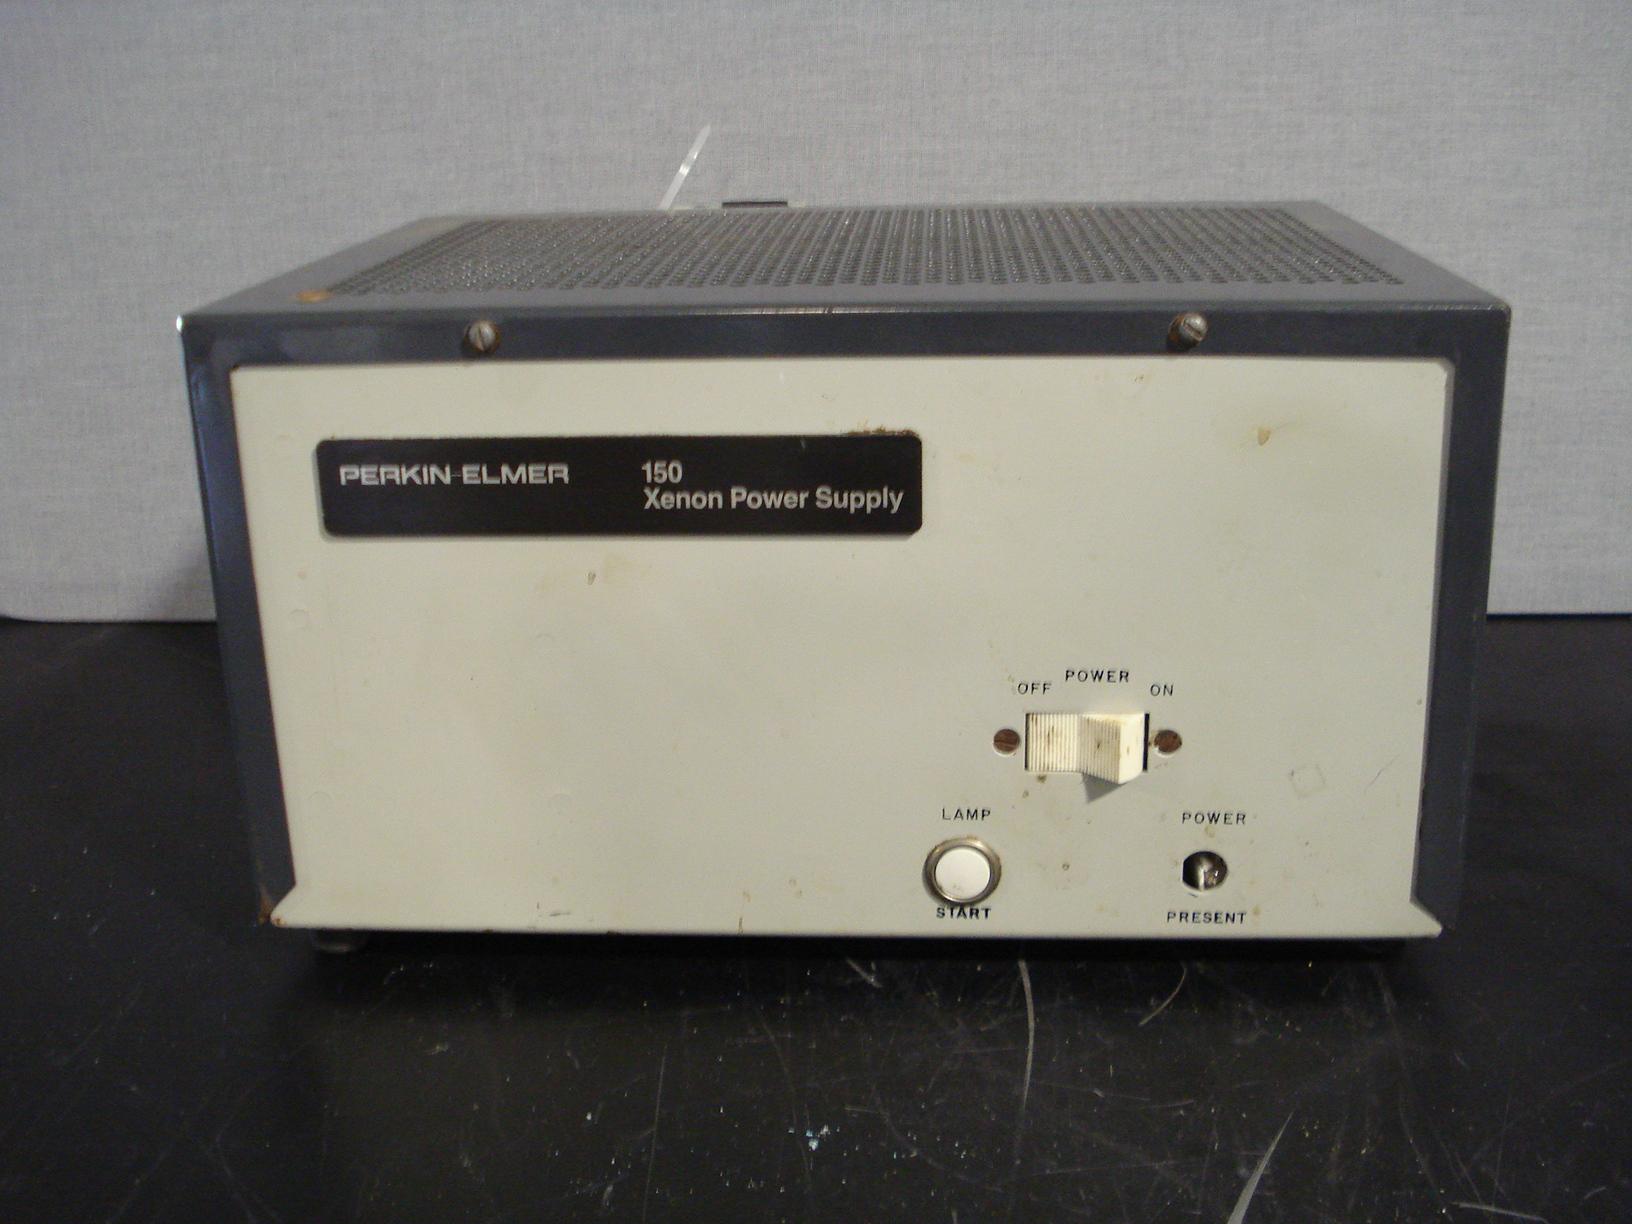 PerkinElmer Xenon Power Supply Model 150 Image